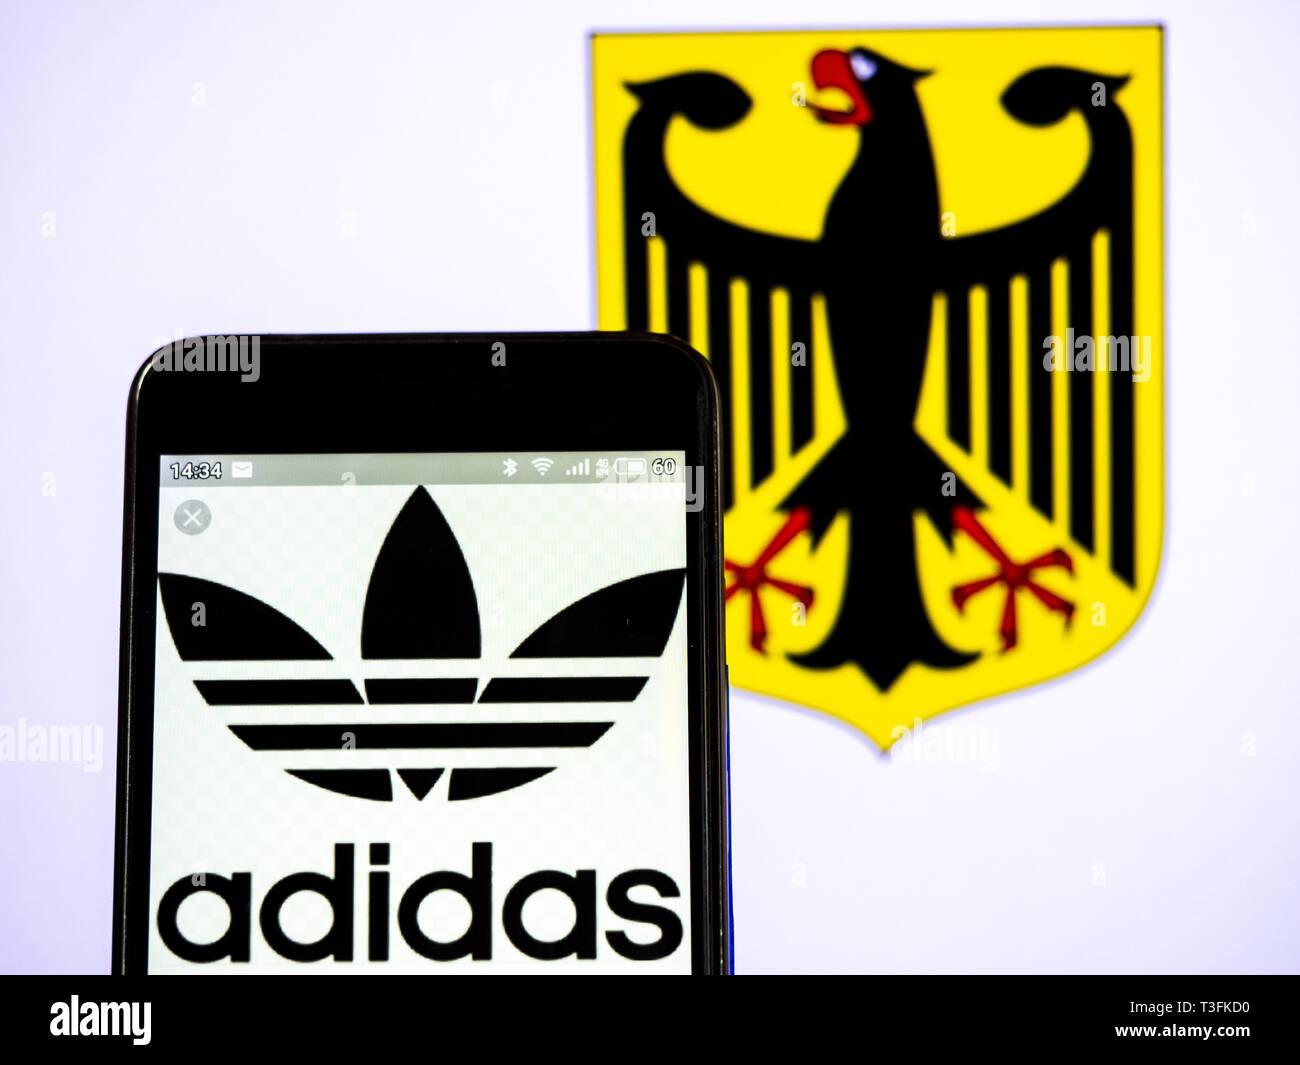 Adidas Ag Stock 54 Off 2mforce Security Com